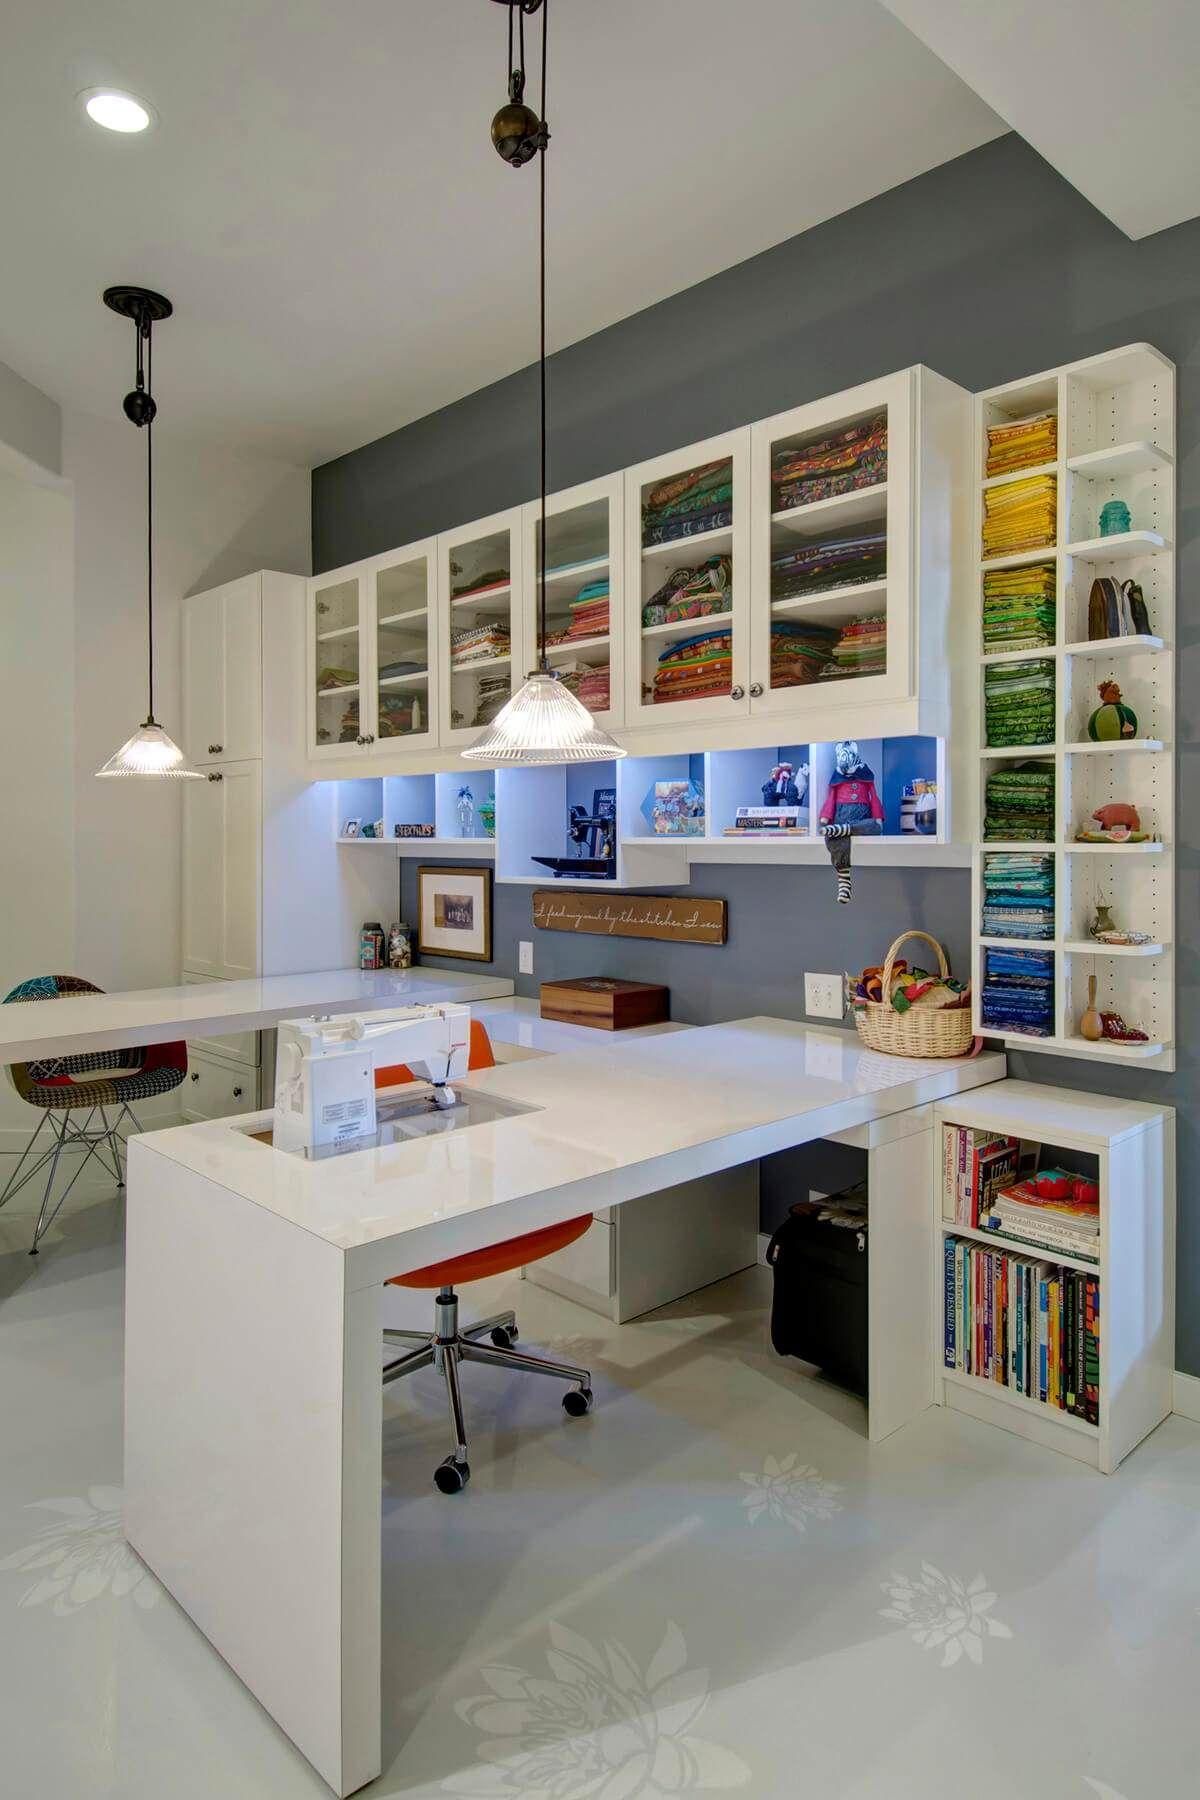 23 Craft Room Design Ideas Creative Rooms Small Craft Rooms